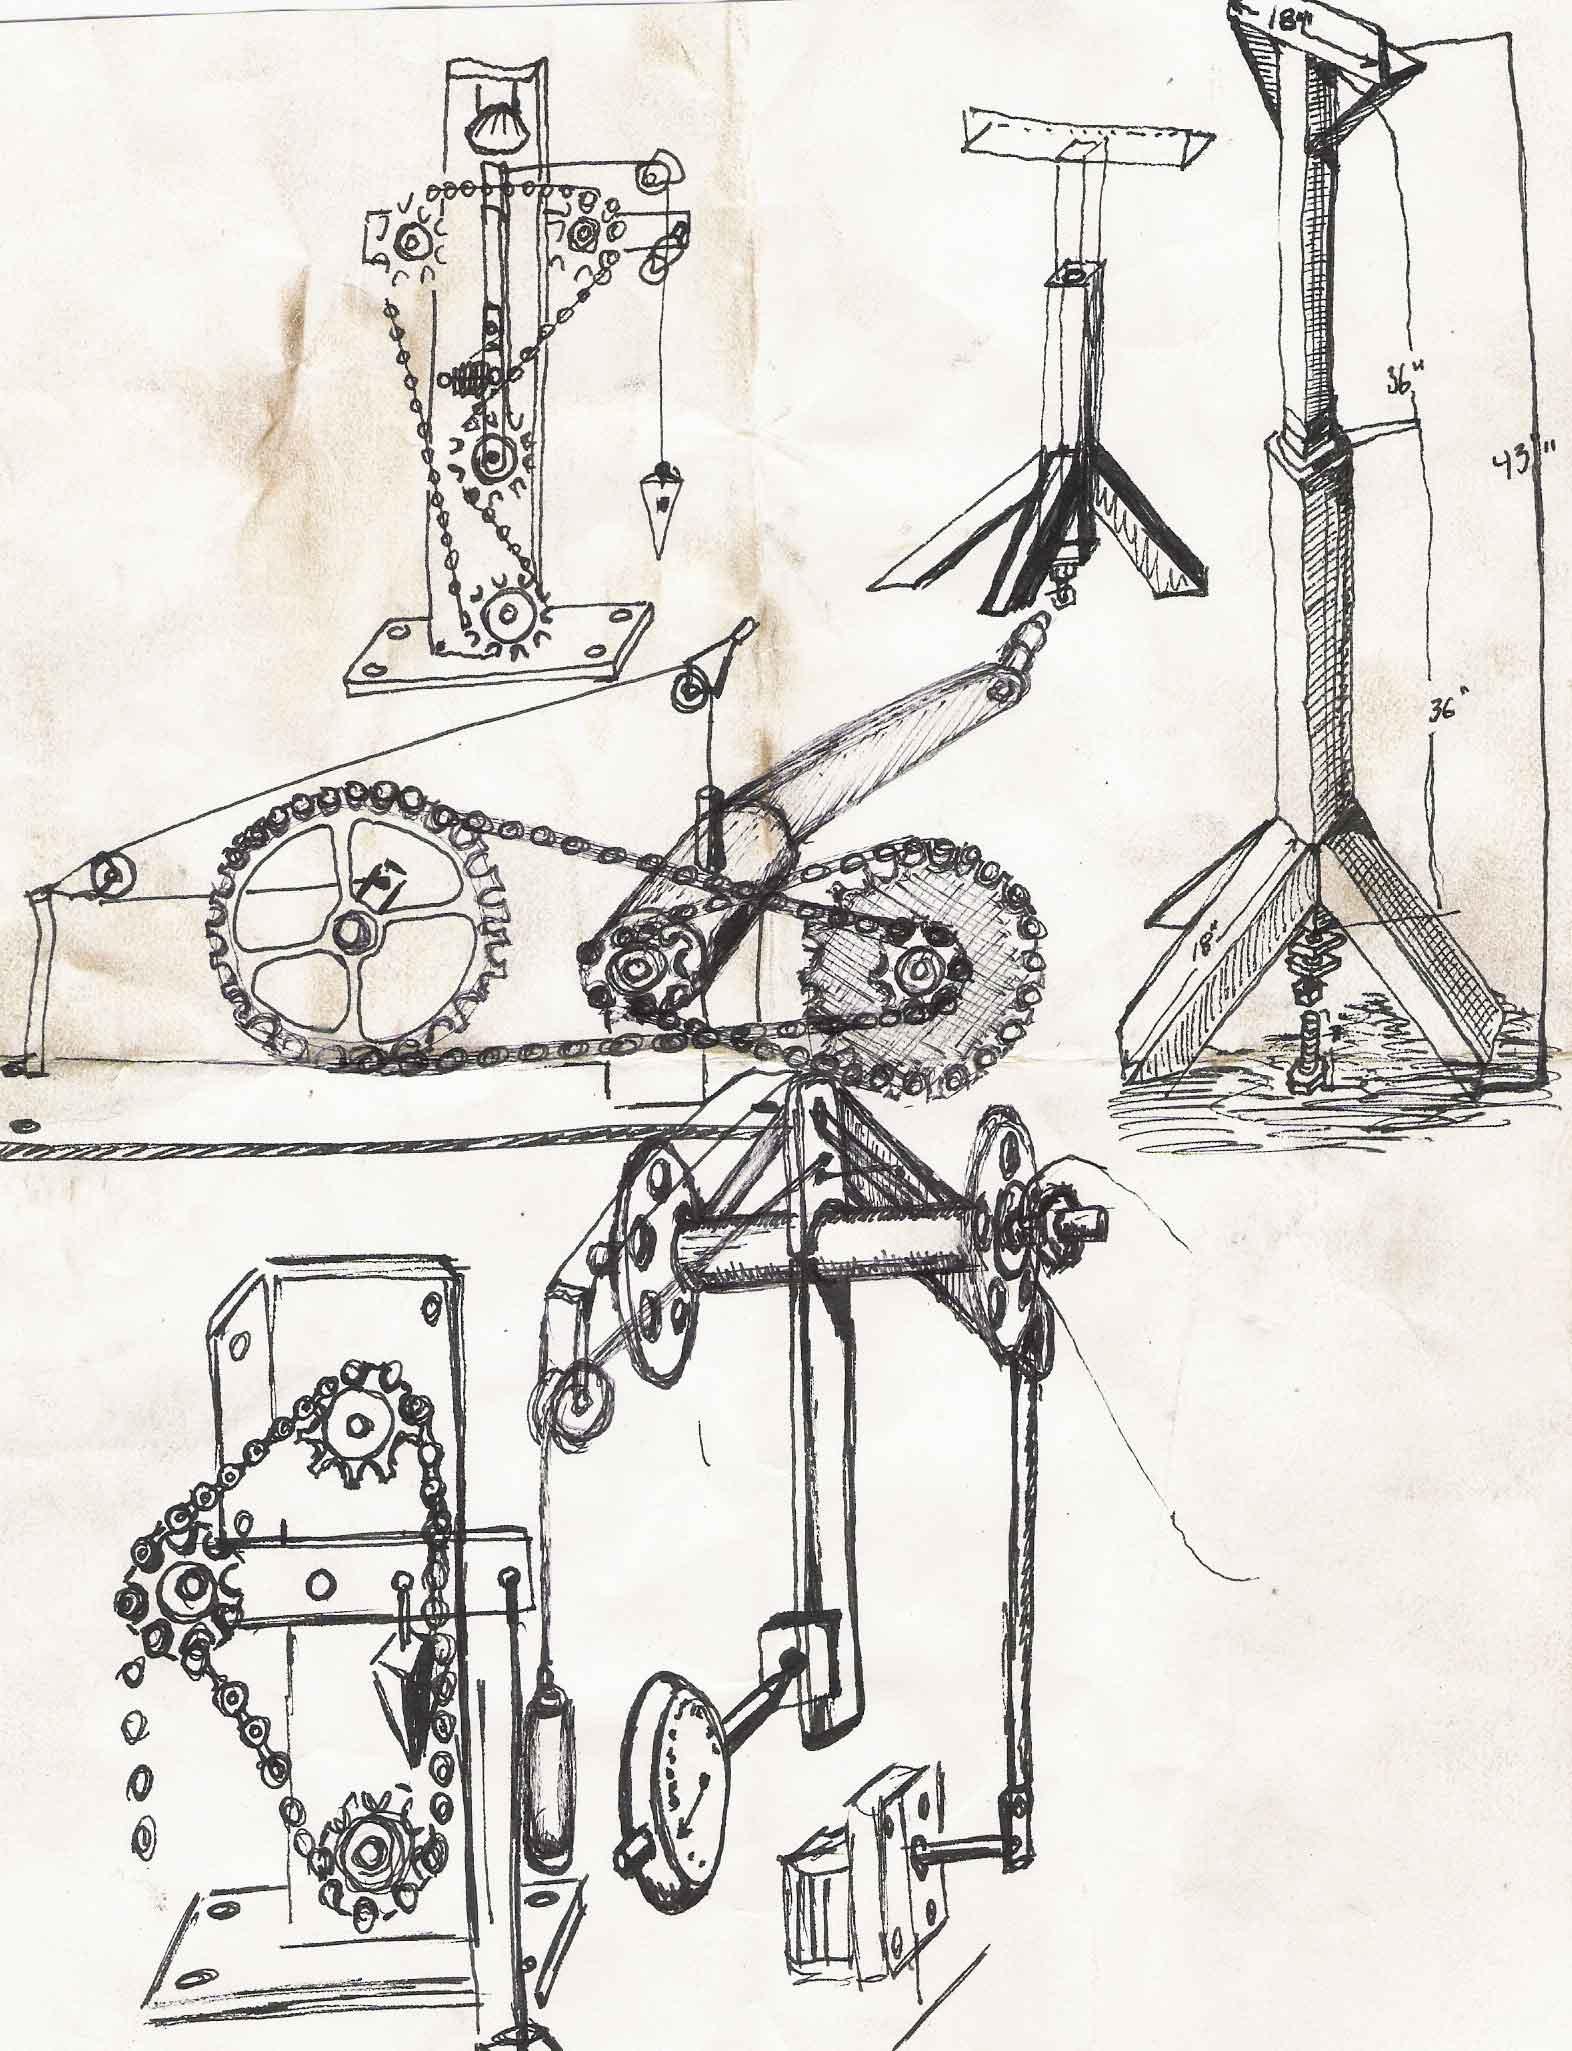 sketch-26-sept-05.jpg